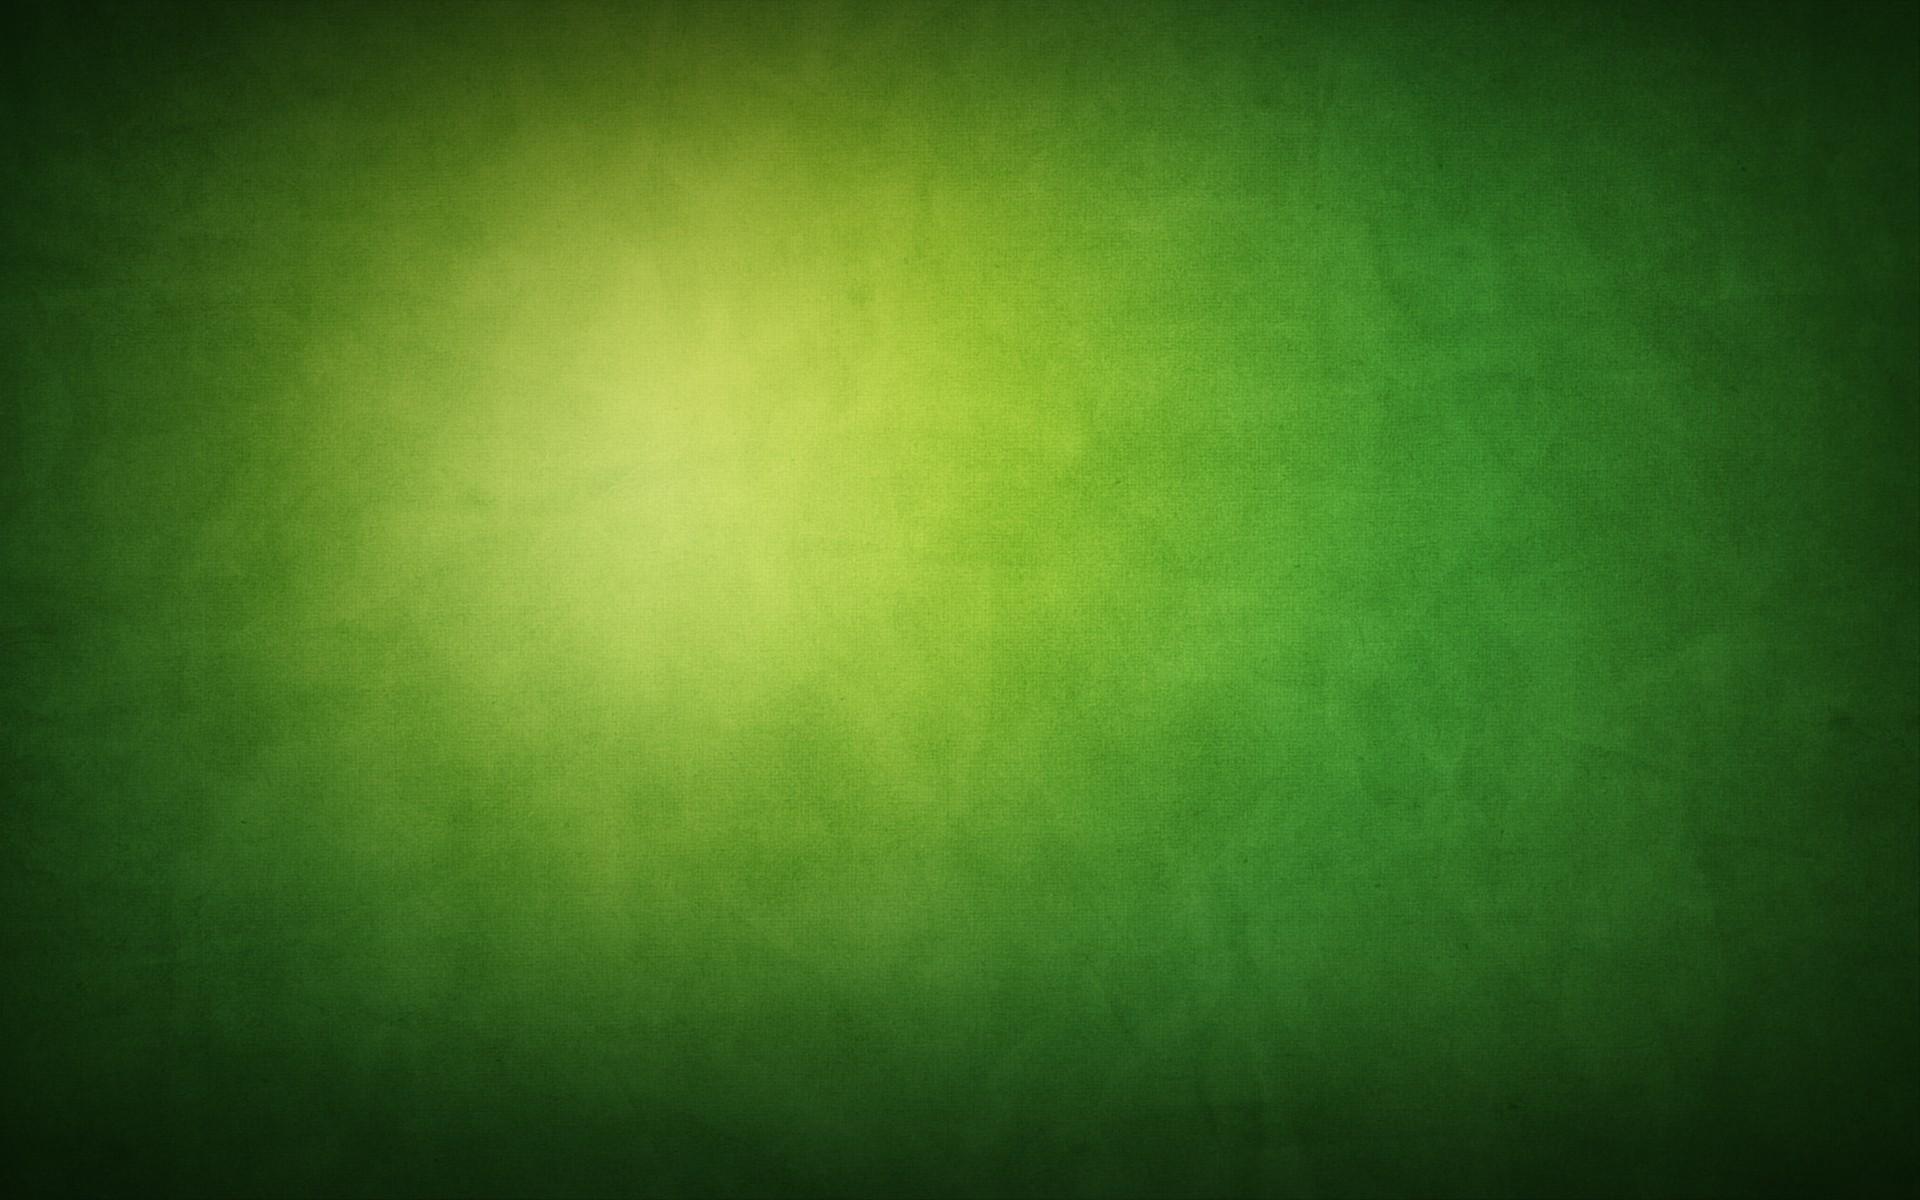 1920x1200 Plain Light Green Wallpapers HD Download